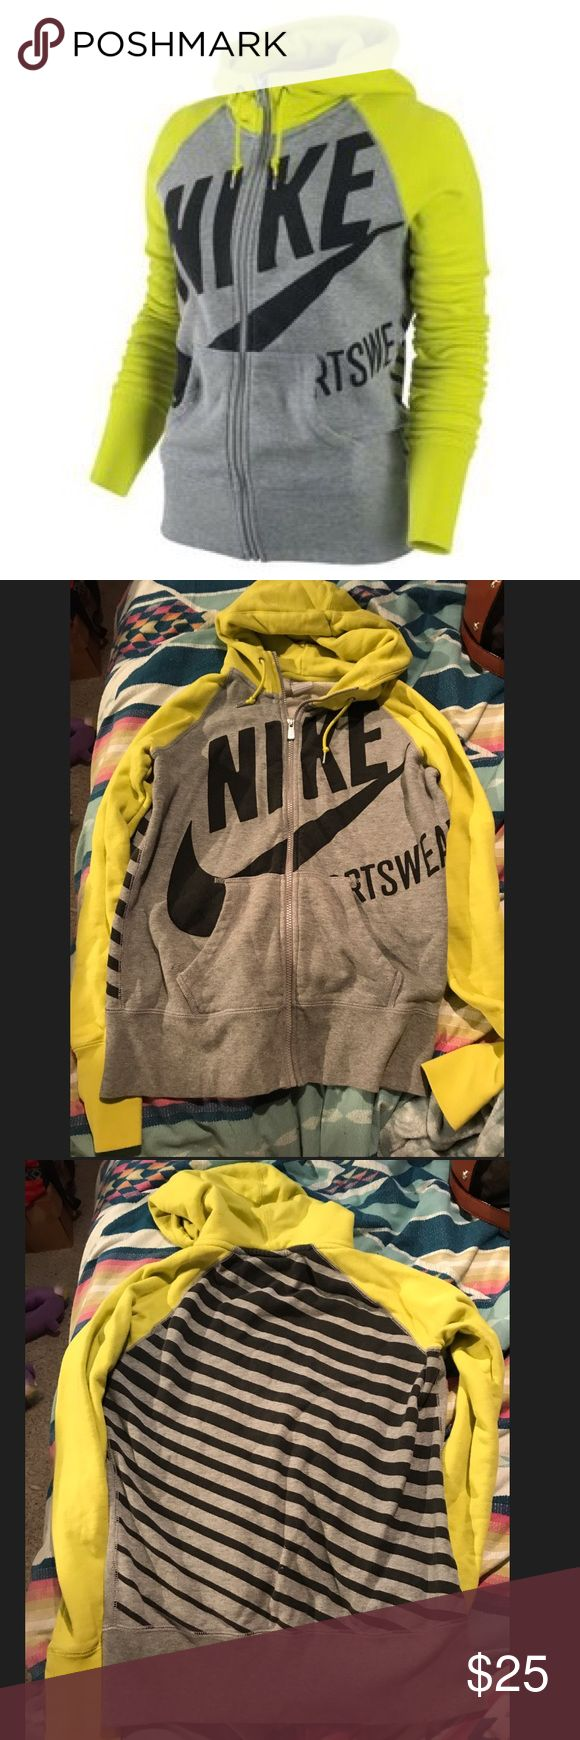 Women's Nike sports jacket Yellow and grey Nike sports jacket// good used condition Nike Tops Sweatshirts & Hoodies